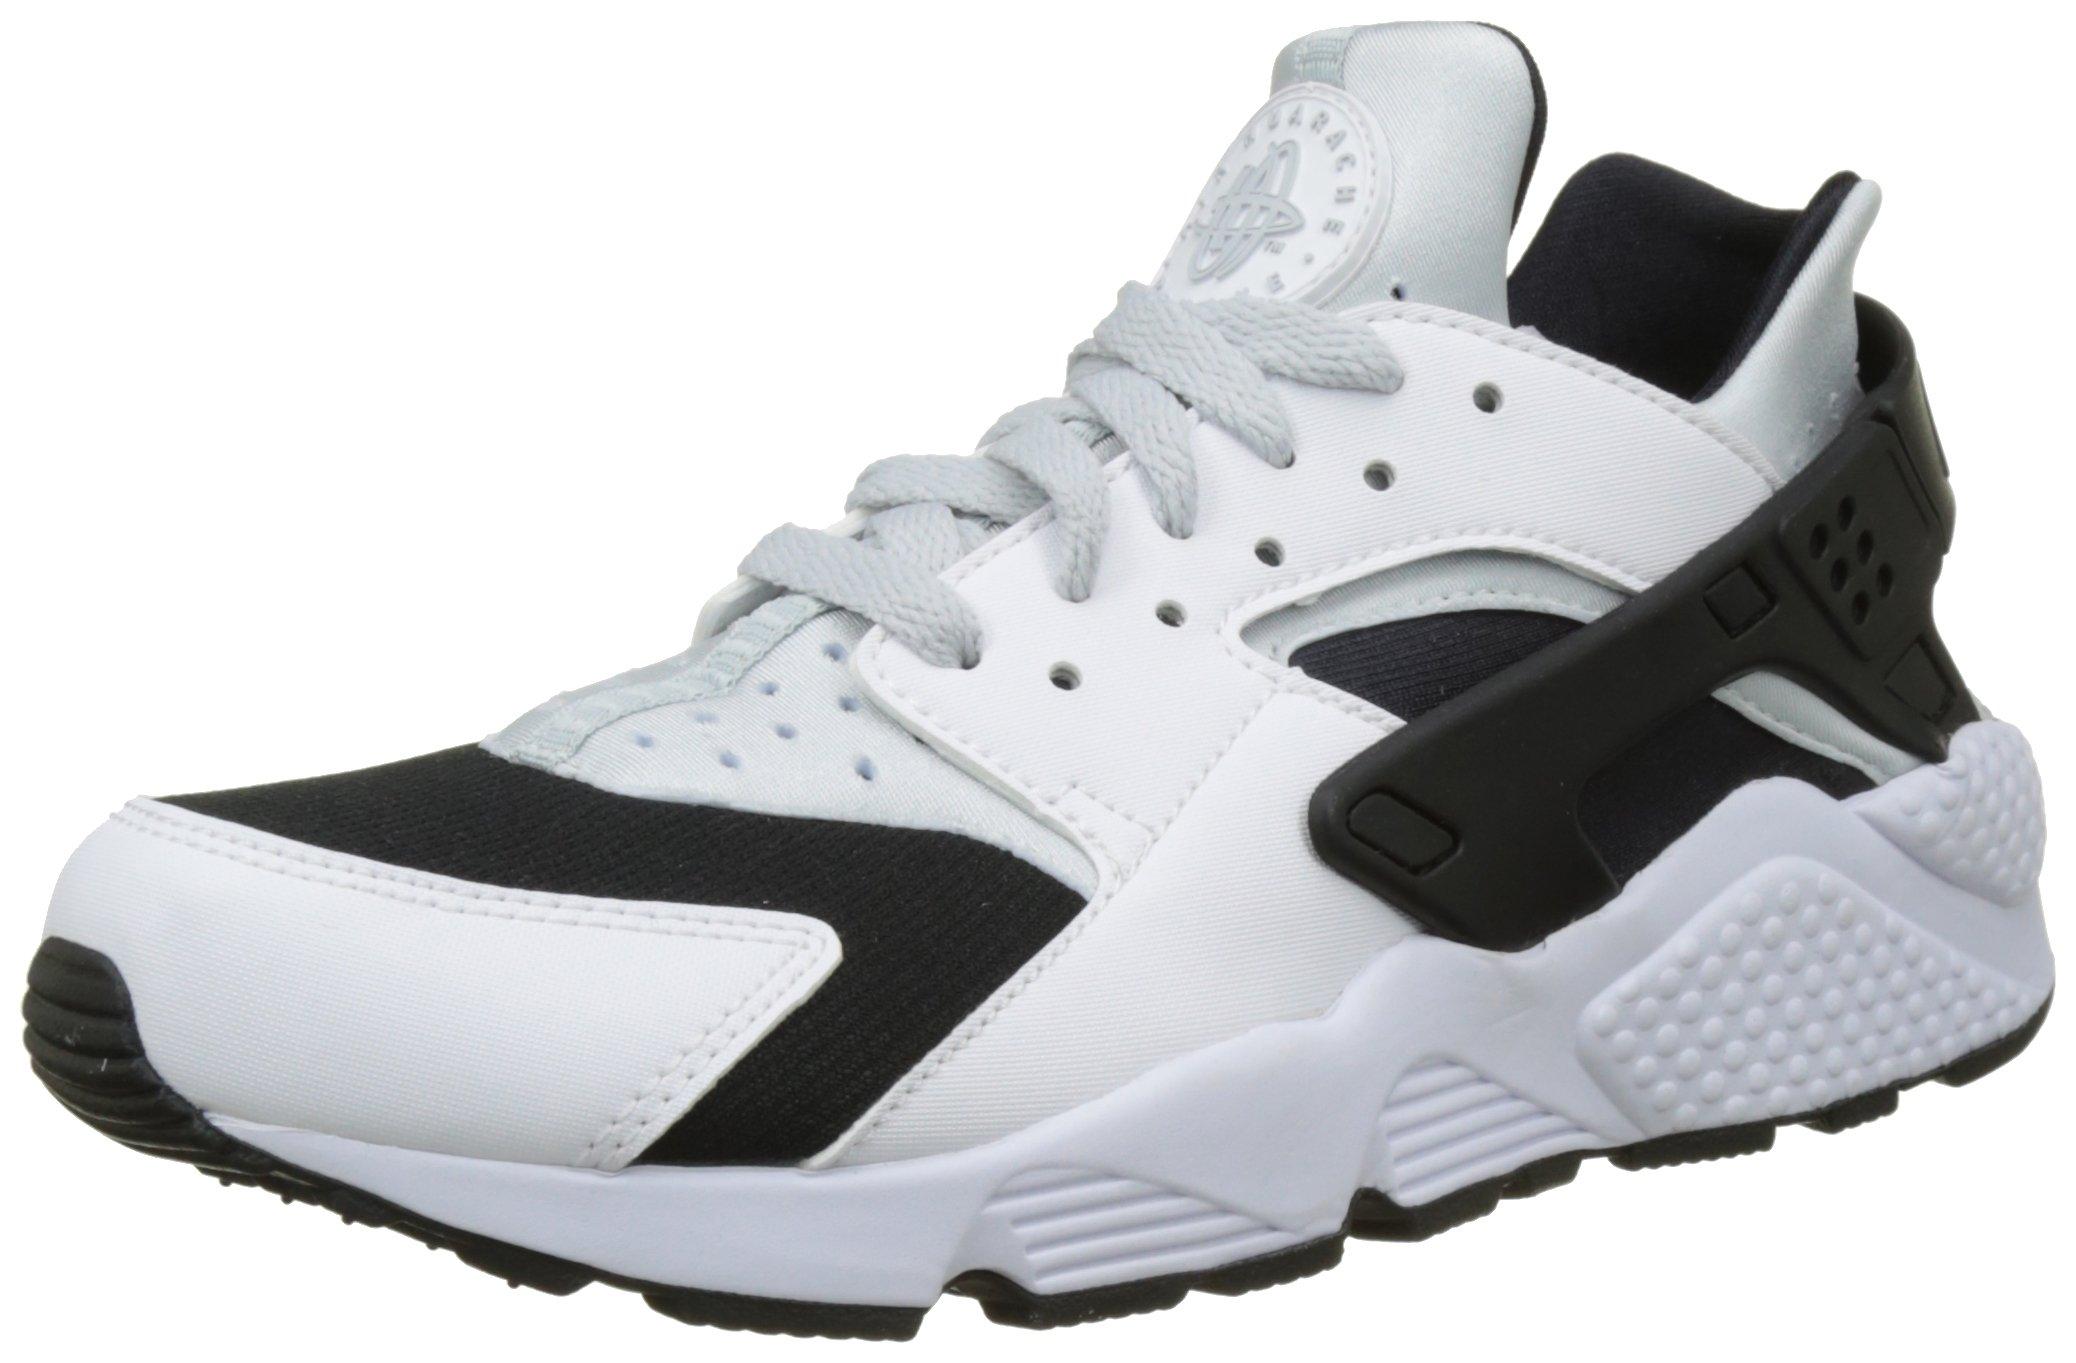 fdf9ebc05b261 Galleon - Nike Air Huarache Men's Shoes White/Pure Platinum 318429-104 (8  D(M) US)